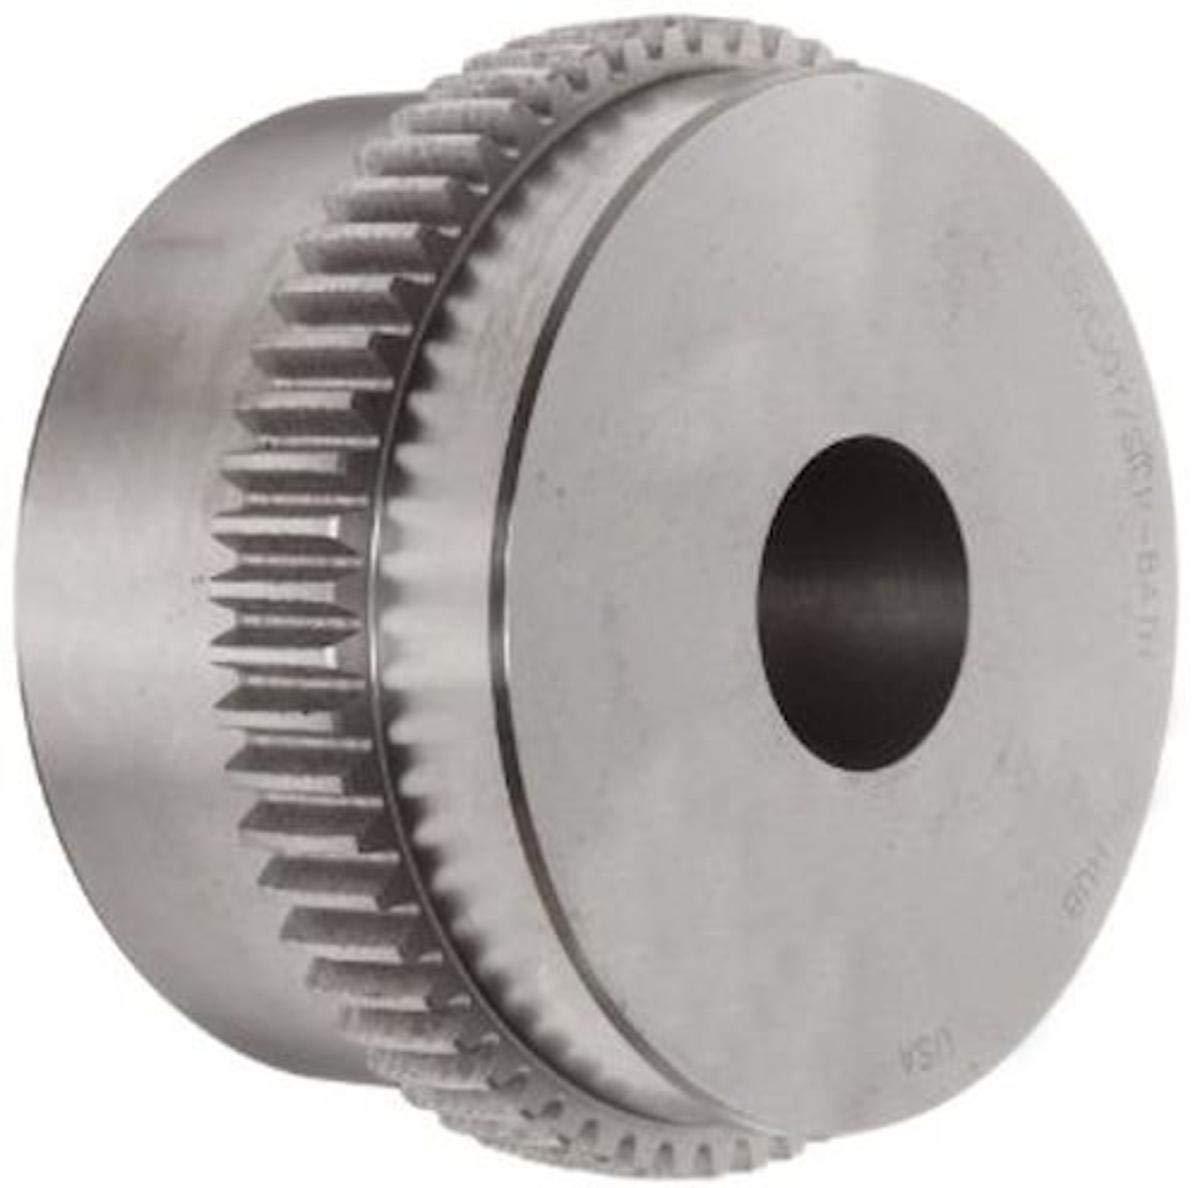 Lovejoy Kansas City Mall 04132 40% OFF Cheap Sale Size FAMM 2.5 Sier-Bath Mill Motor Sleeve Flanged